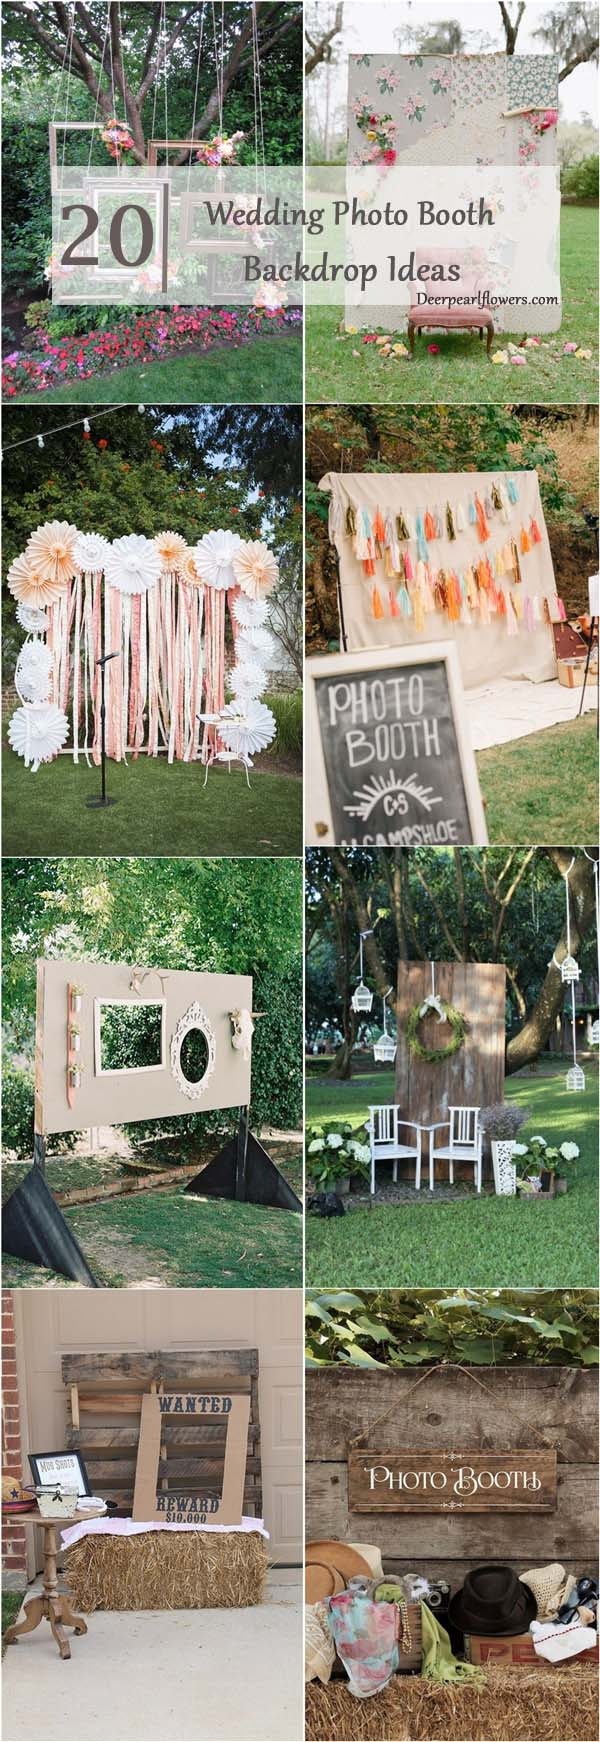 Photobooth Wedding Ideas 20 Brilliant Wedding Photo Booth Ideas Deer Pearl Flowers